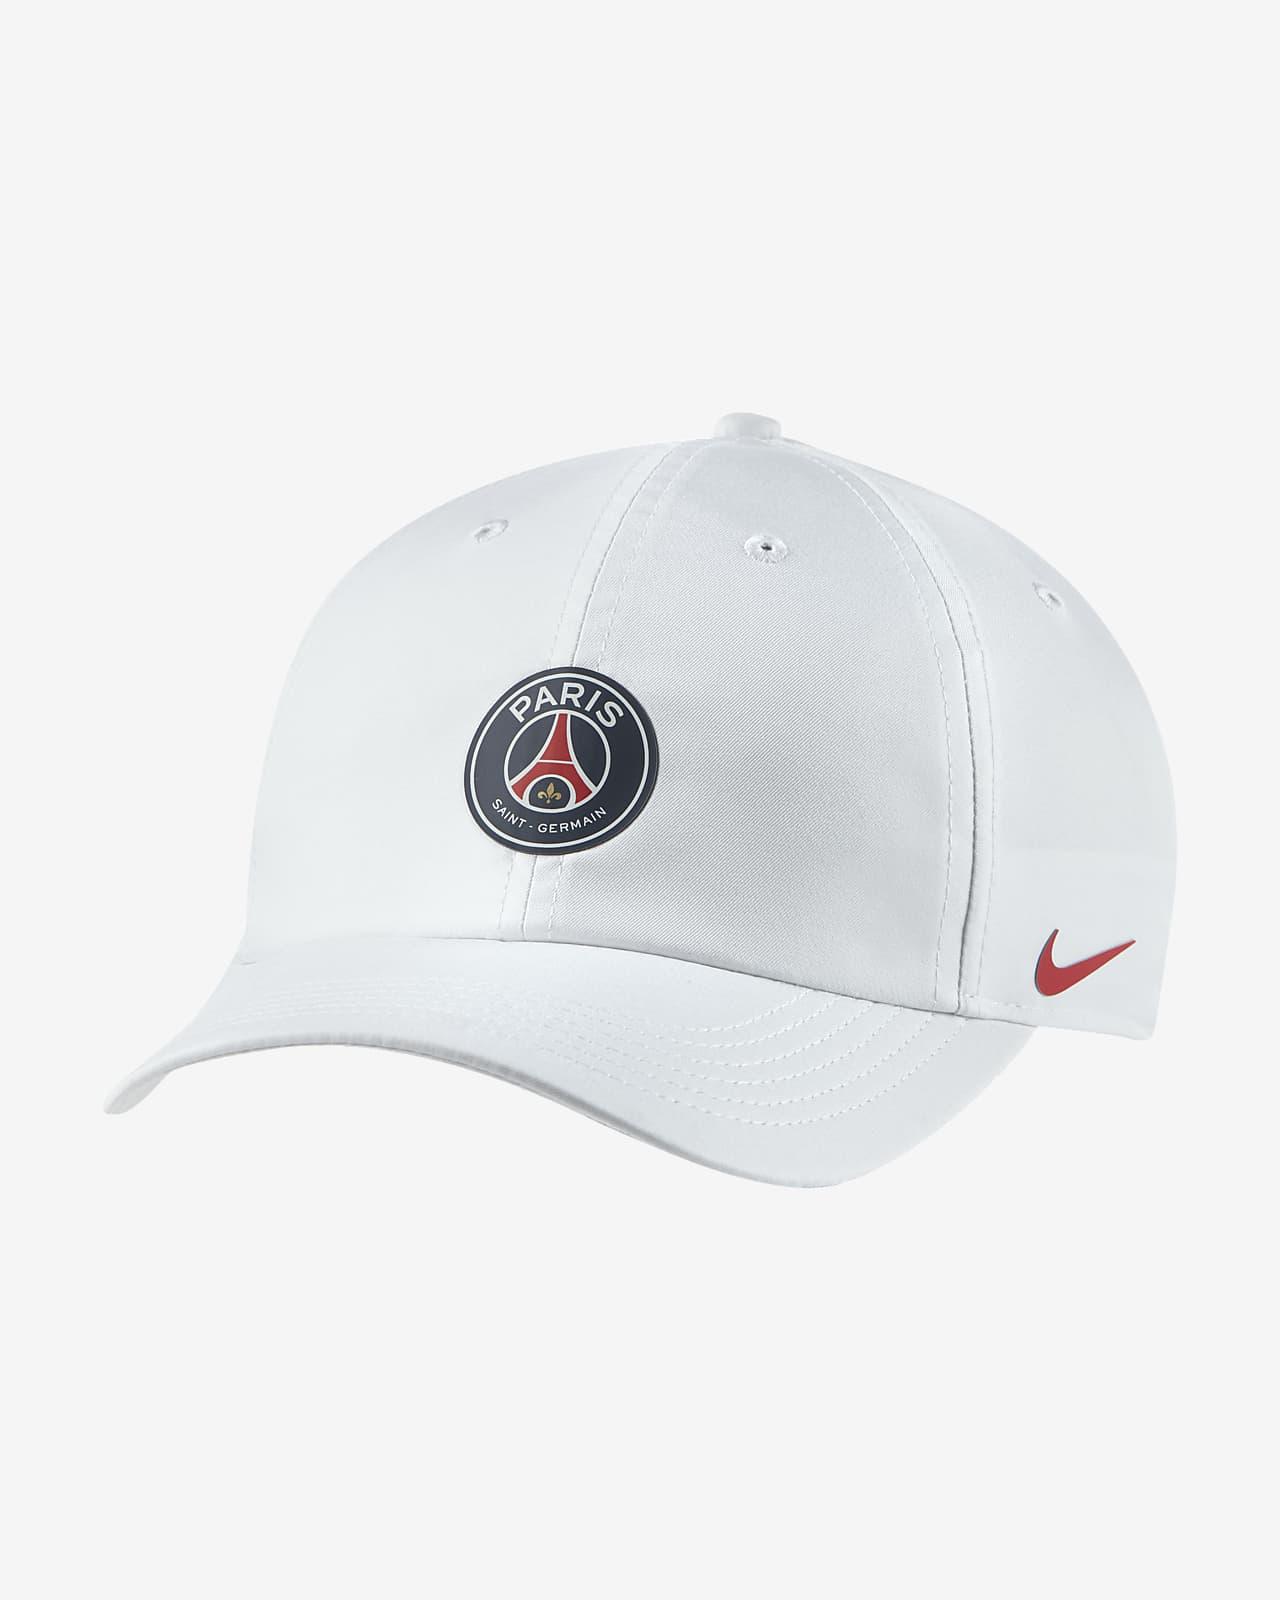 Nike Dri-FIT París Saint-Germain Heritage86 Gorra regulable - Niño/a